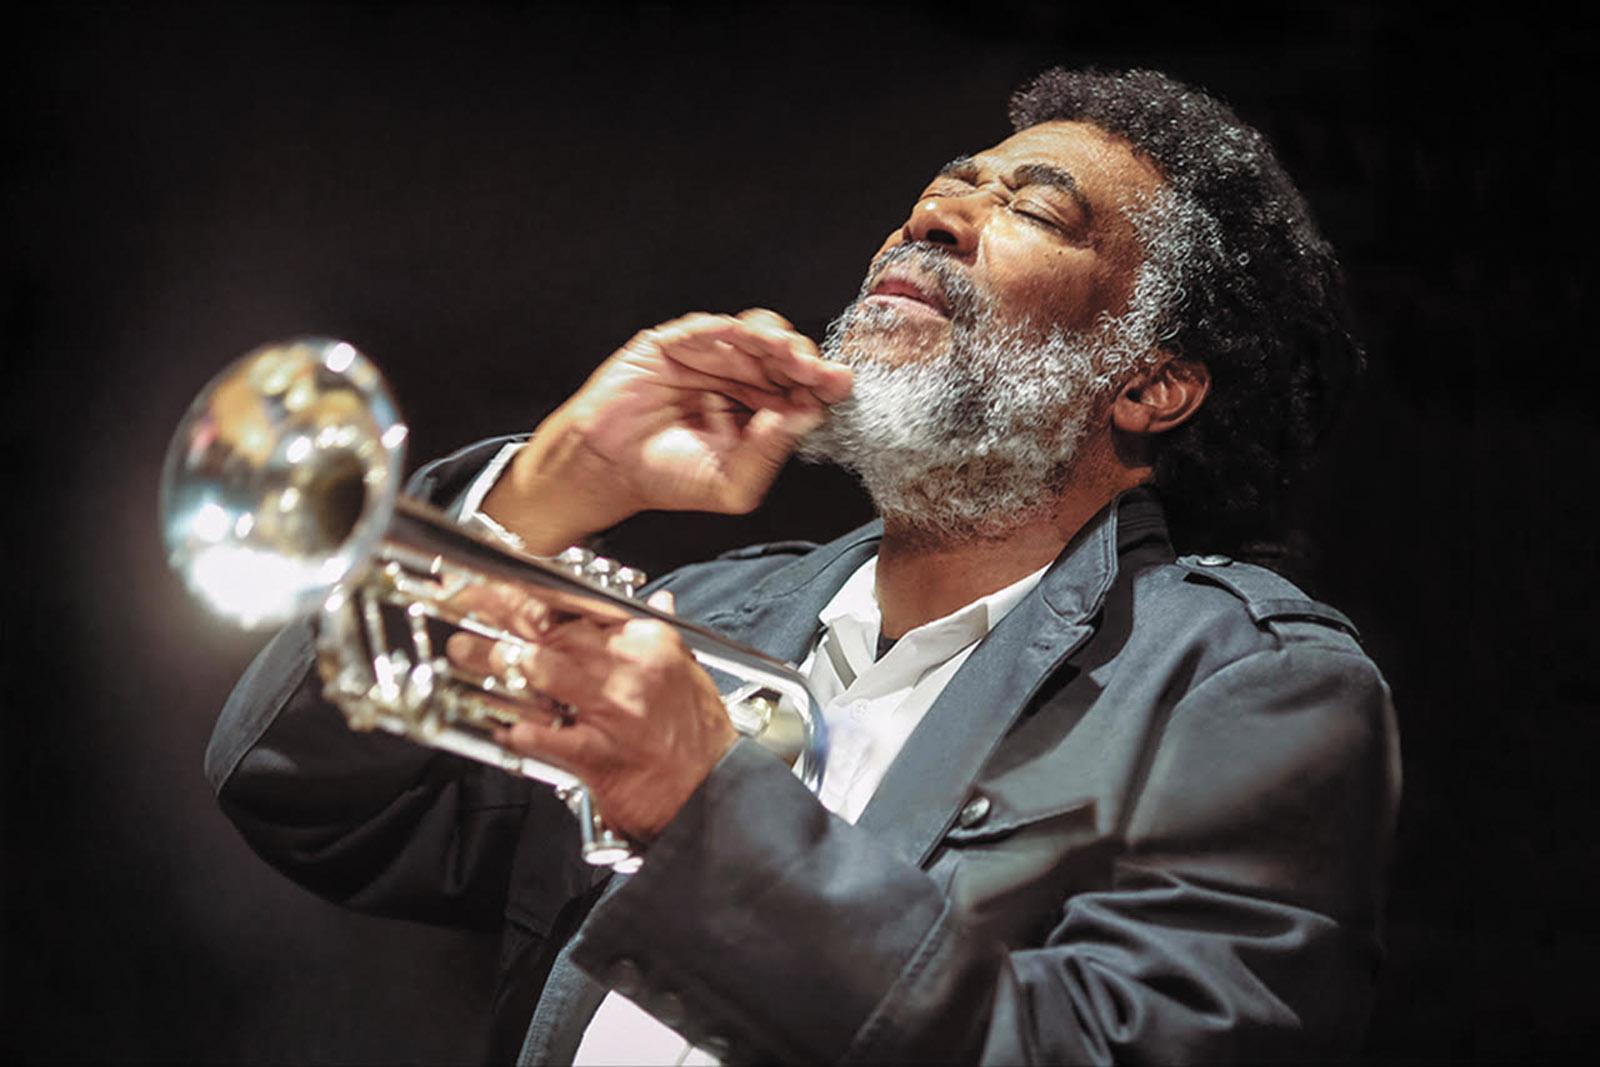 Wadada Leo Smith at the Montreal Jazz Festival, July 2016